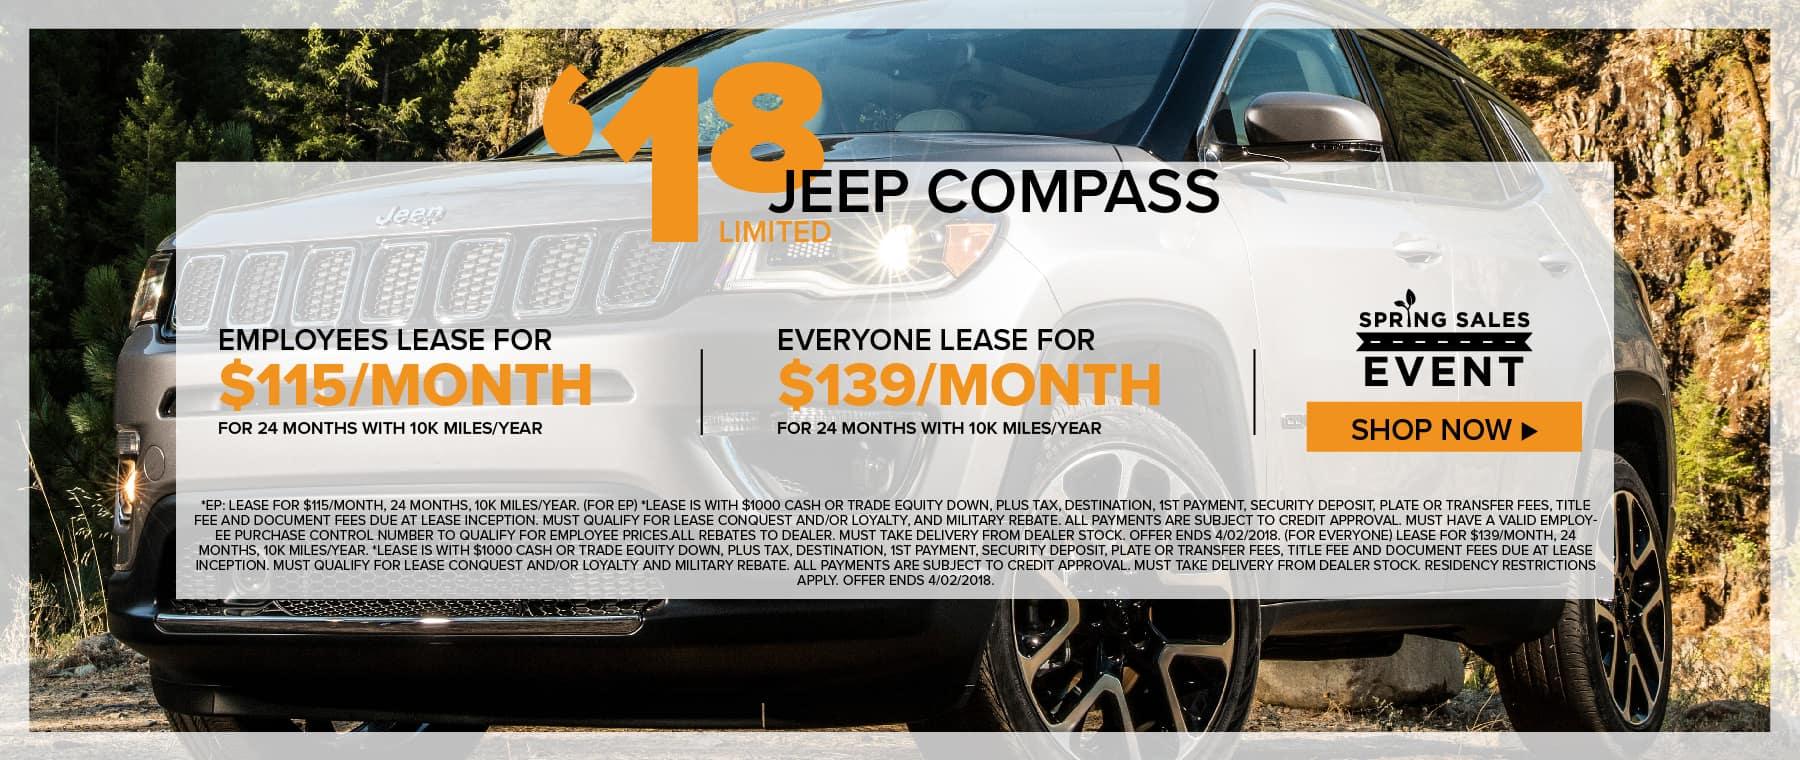 LaFontaine Chrysler Dodge Jeep Ram Of Fenton Chrysler Dodge - Chrysler dealership phone number